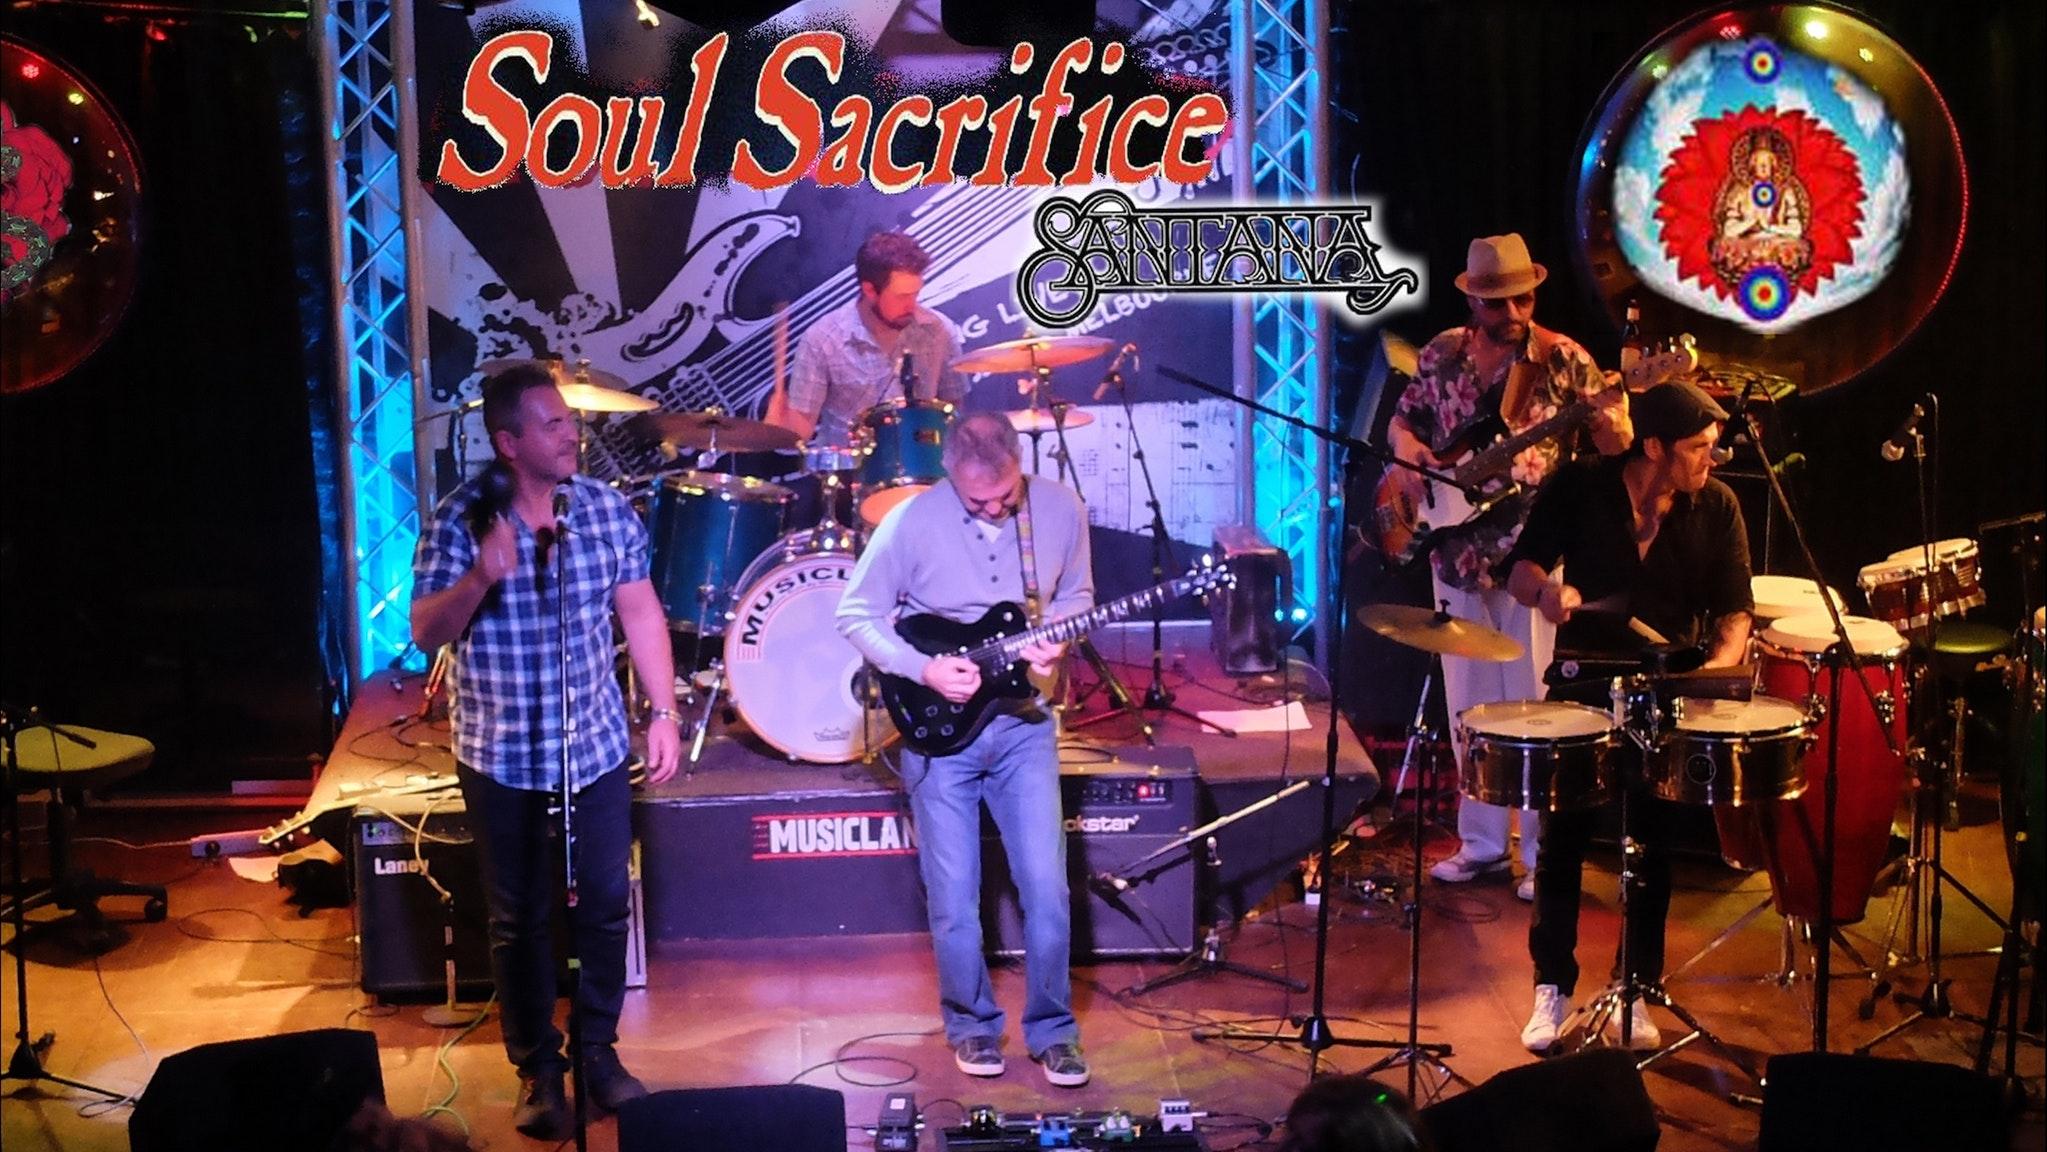 Soul Sacrifice will play the Carlos Santana Song book at Bird's Basement on the  12th of October